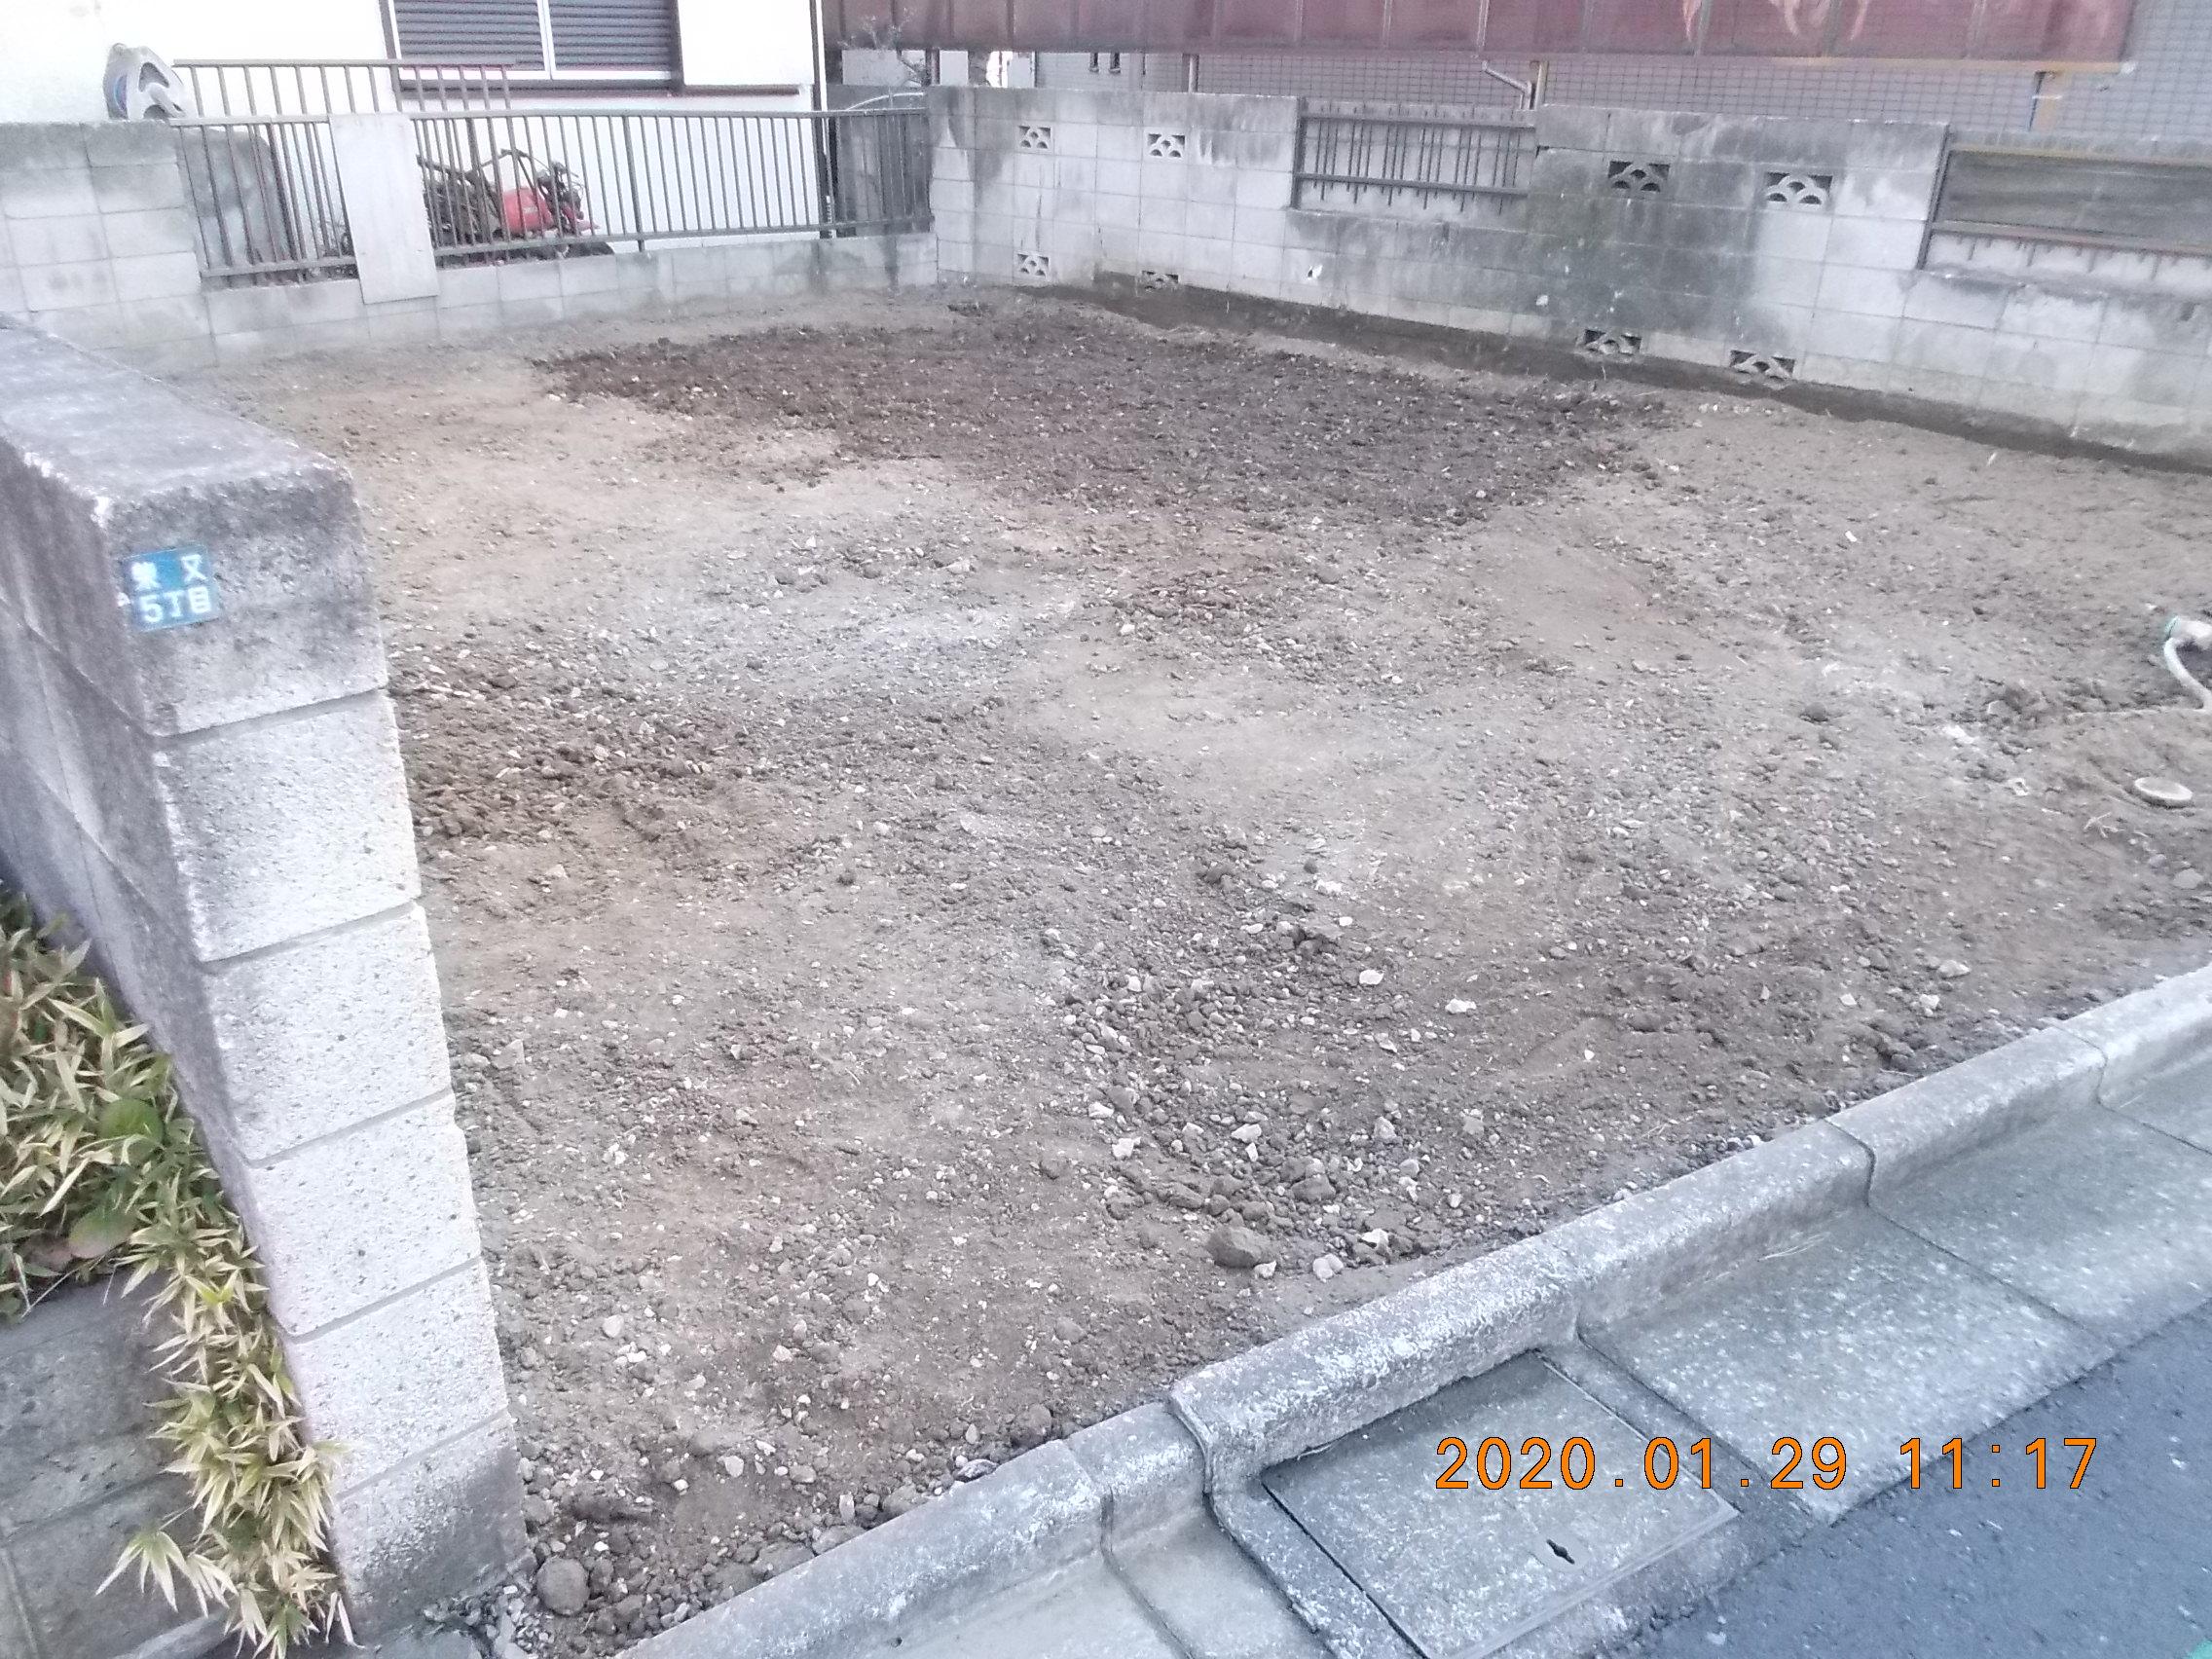 葛飾区柴又 家・空き家解体